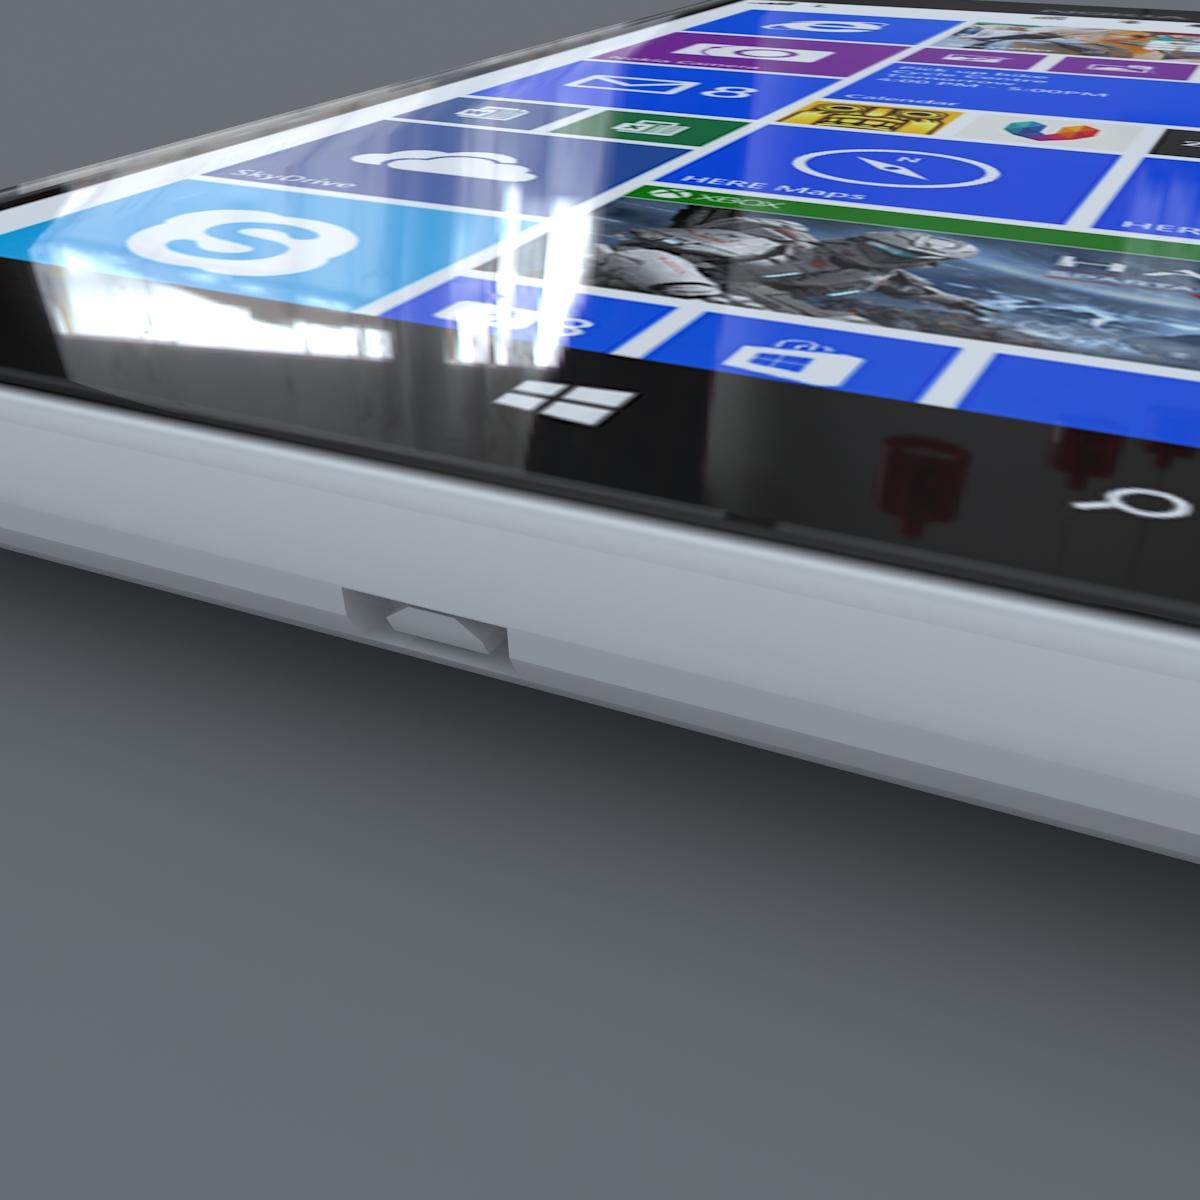 nokia lumia 1520 white 3d model max fbx c4d lxo ma mb obj 158426